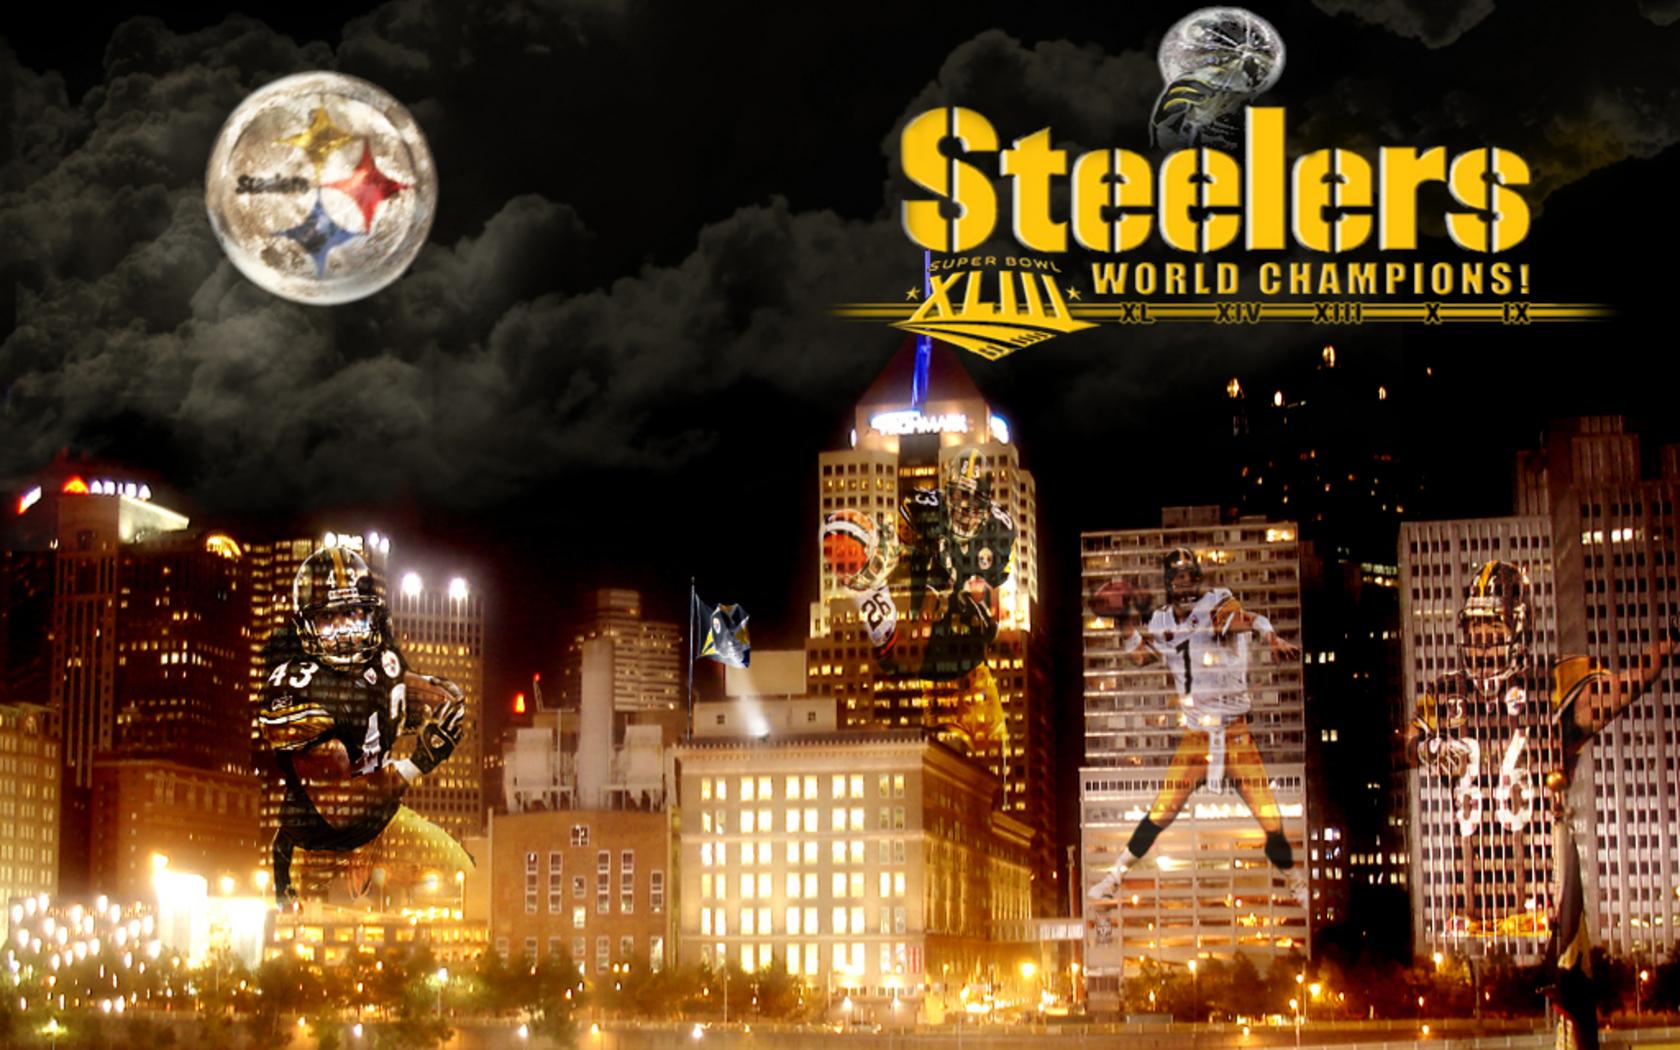 Enjoy this new Pittsburgh Steelers desktop background 1680x1050